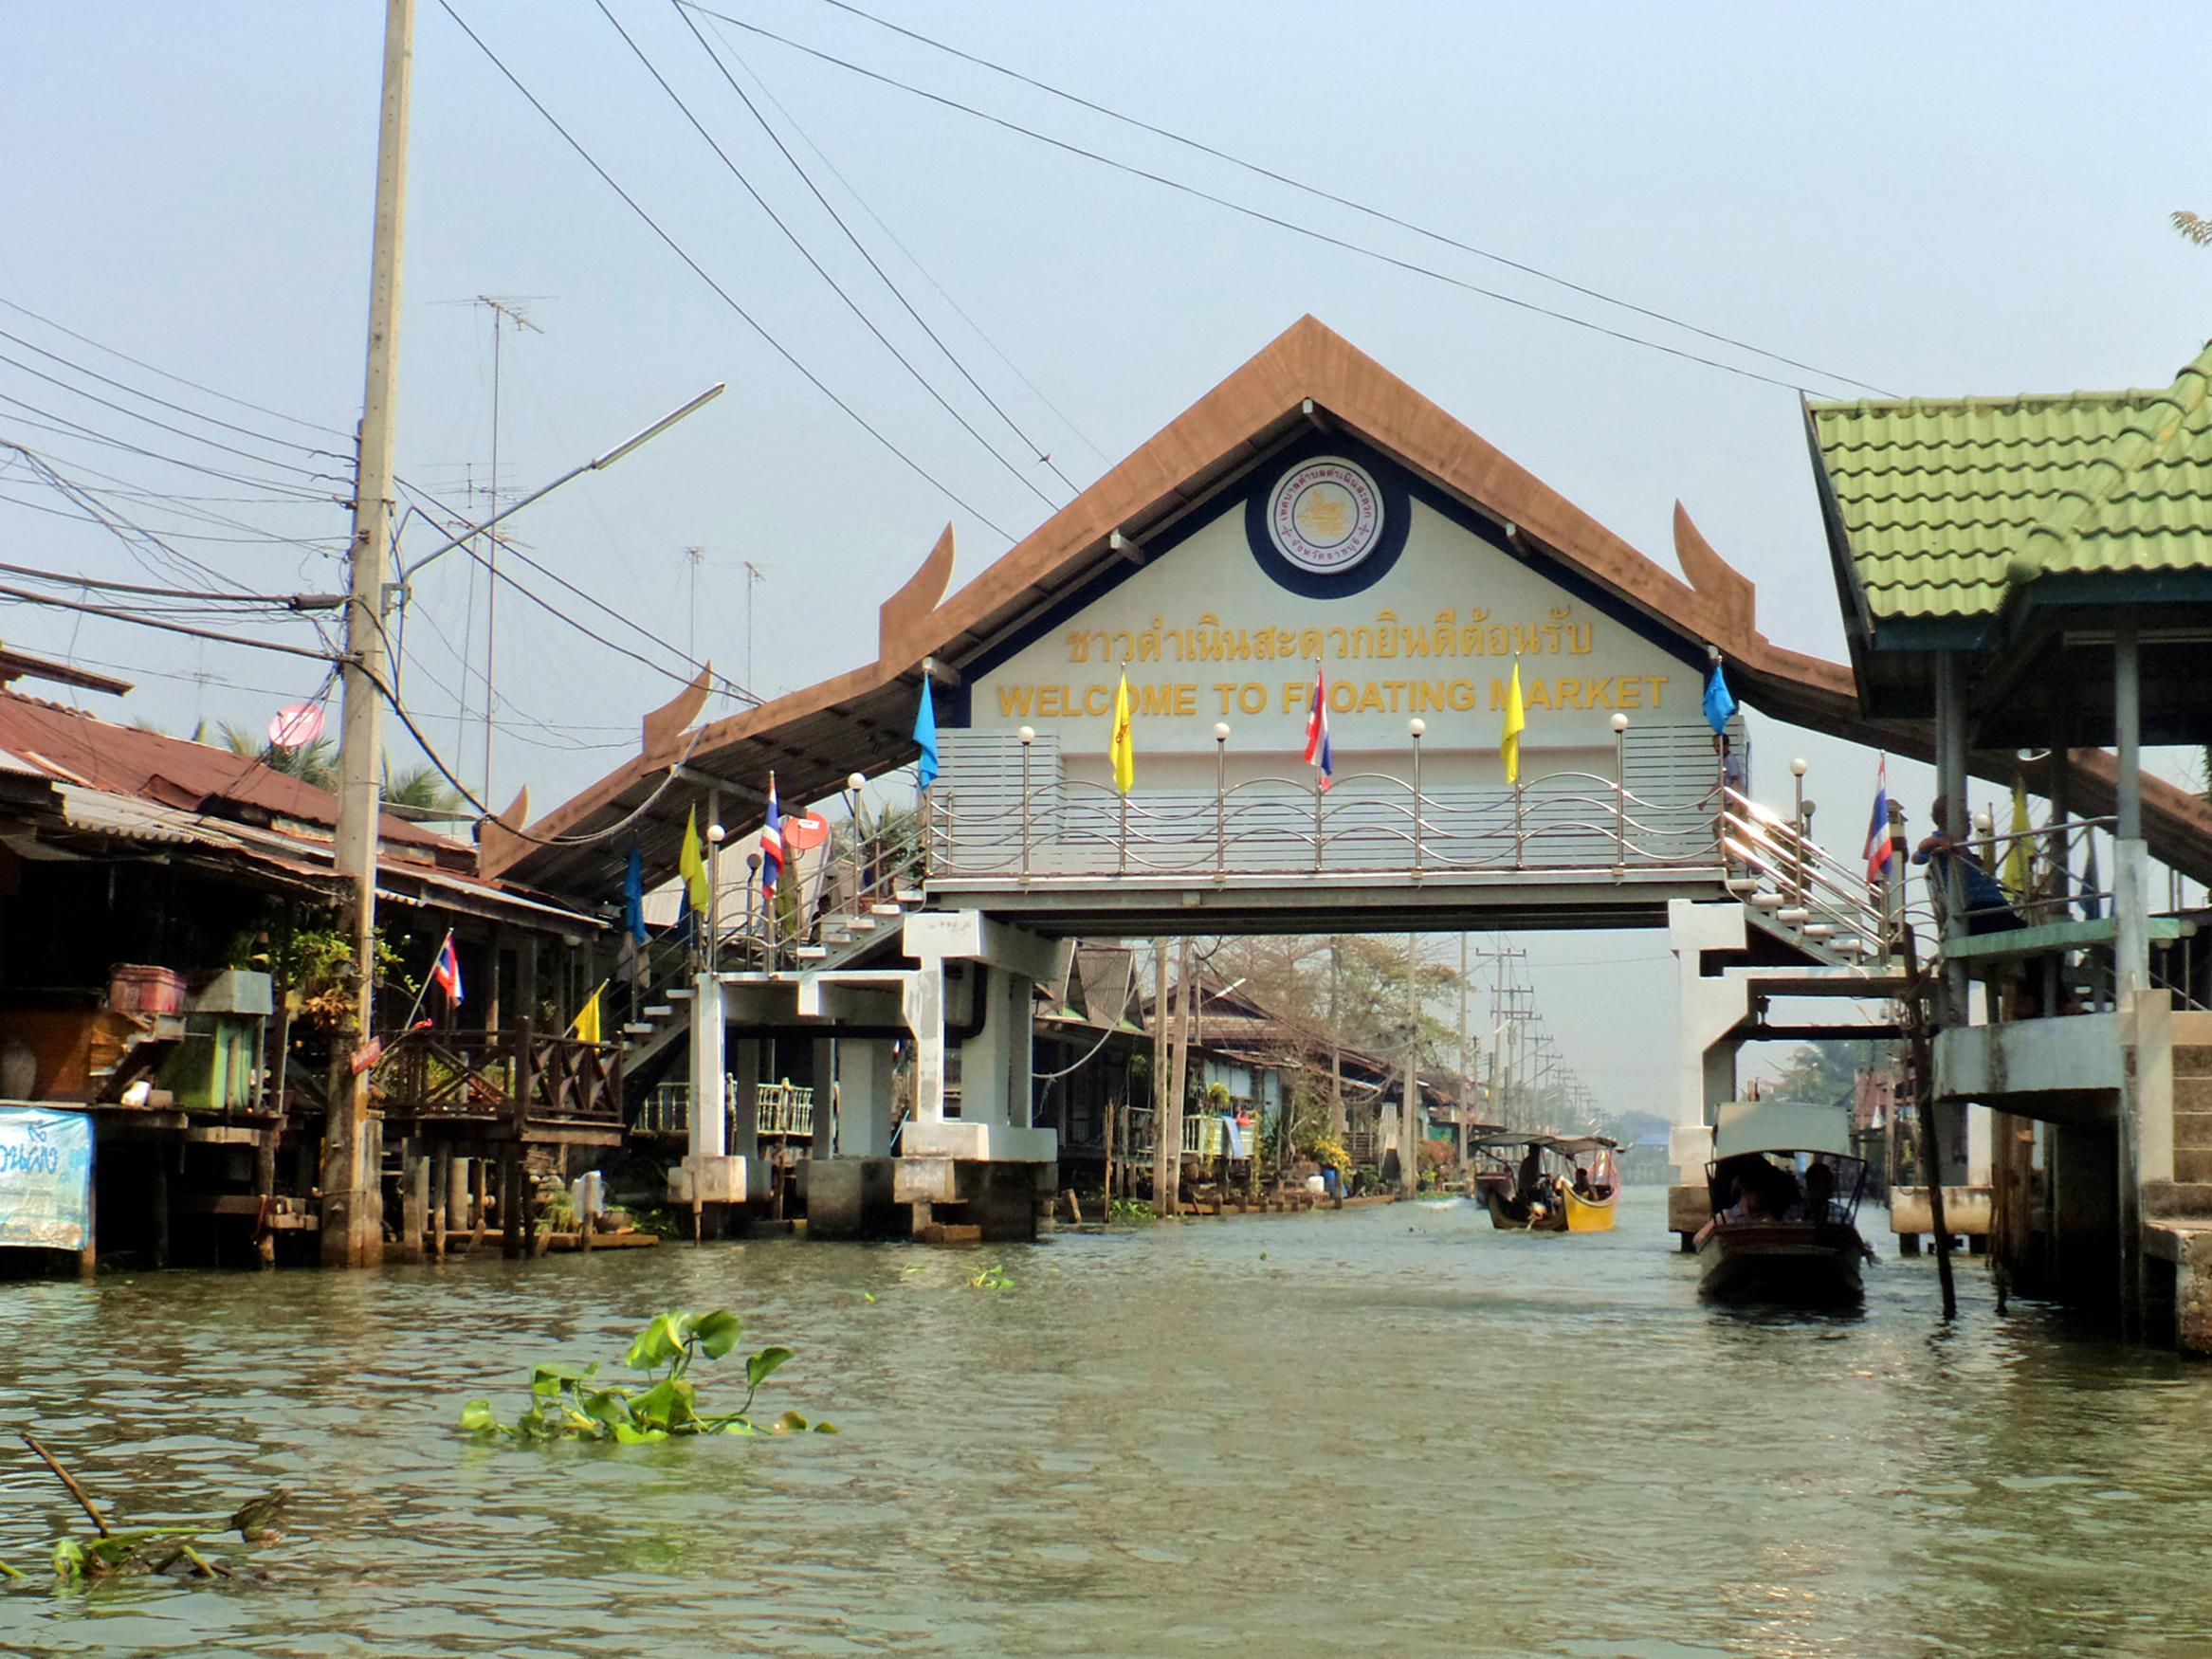 bangkok_tailandia_damnoensaduak_1